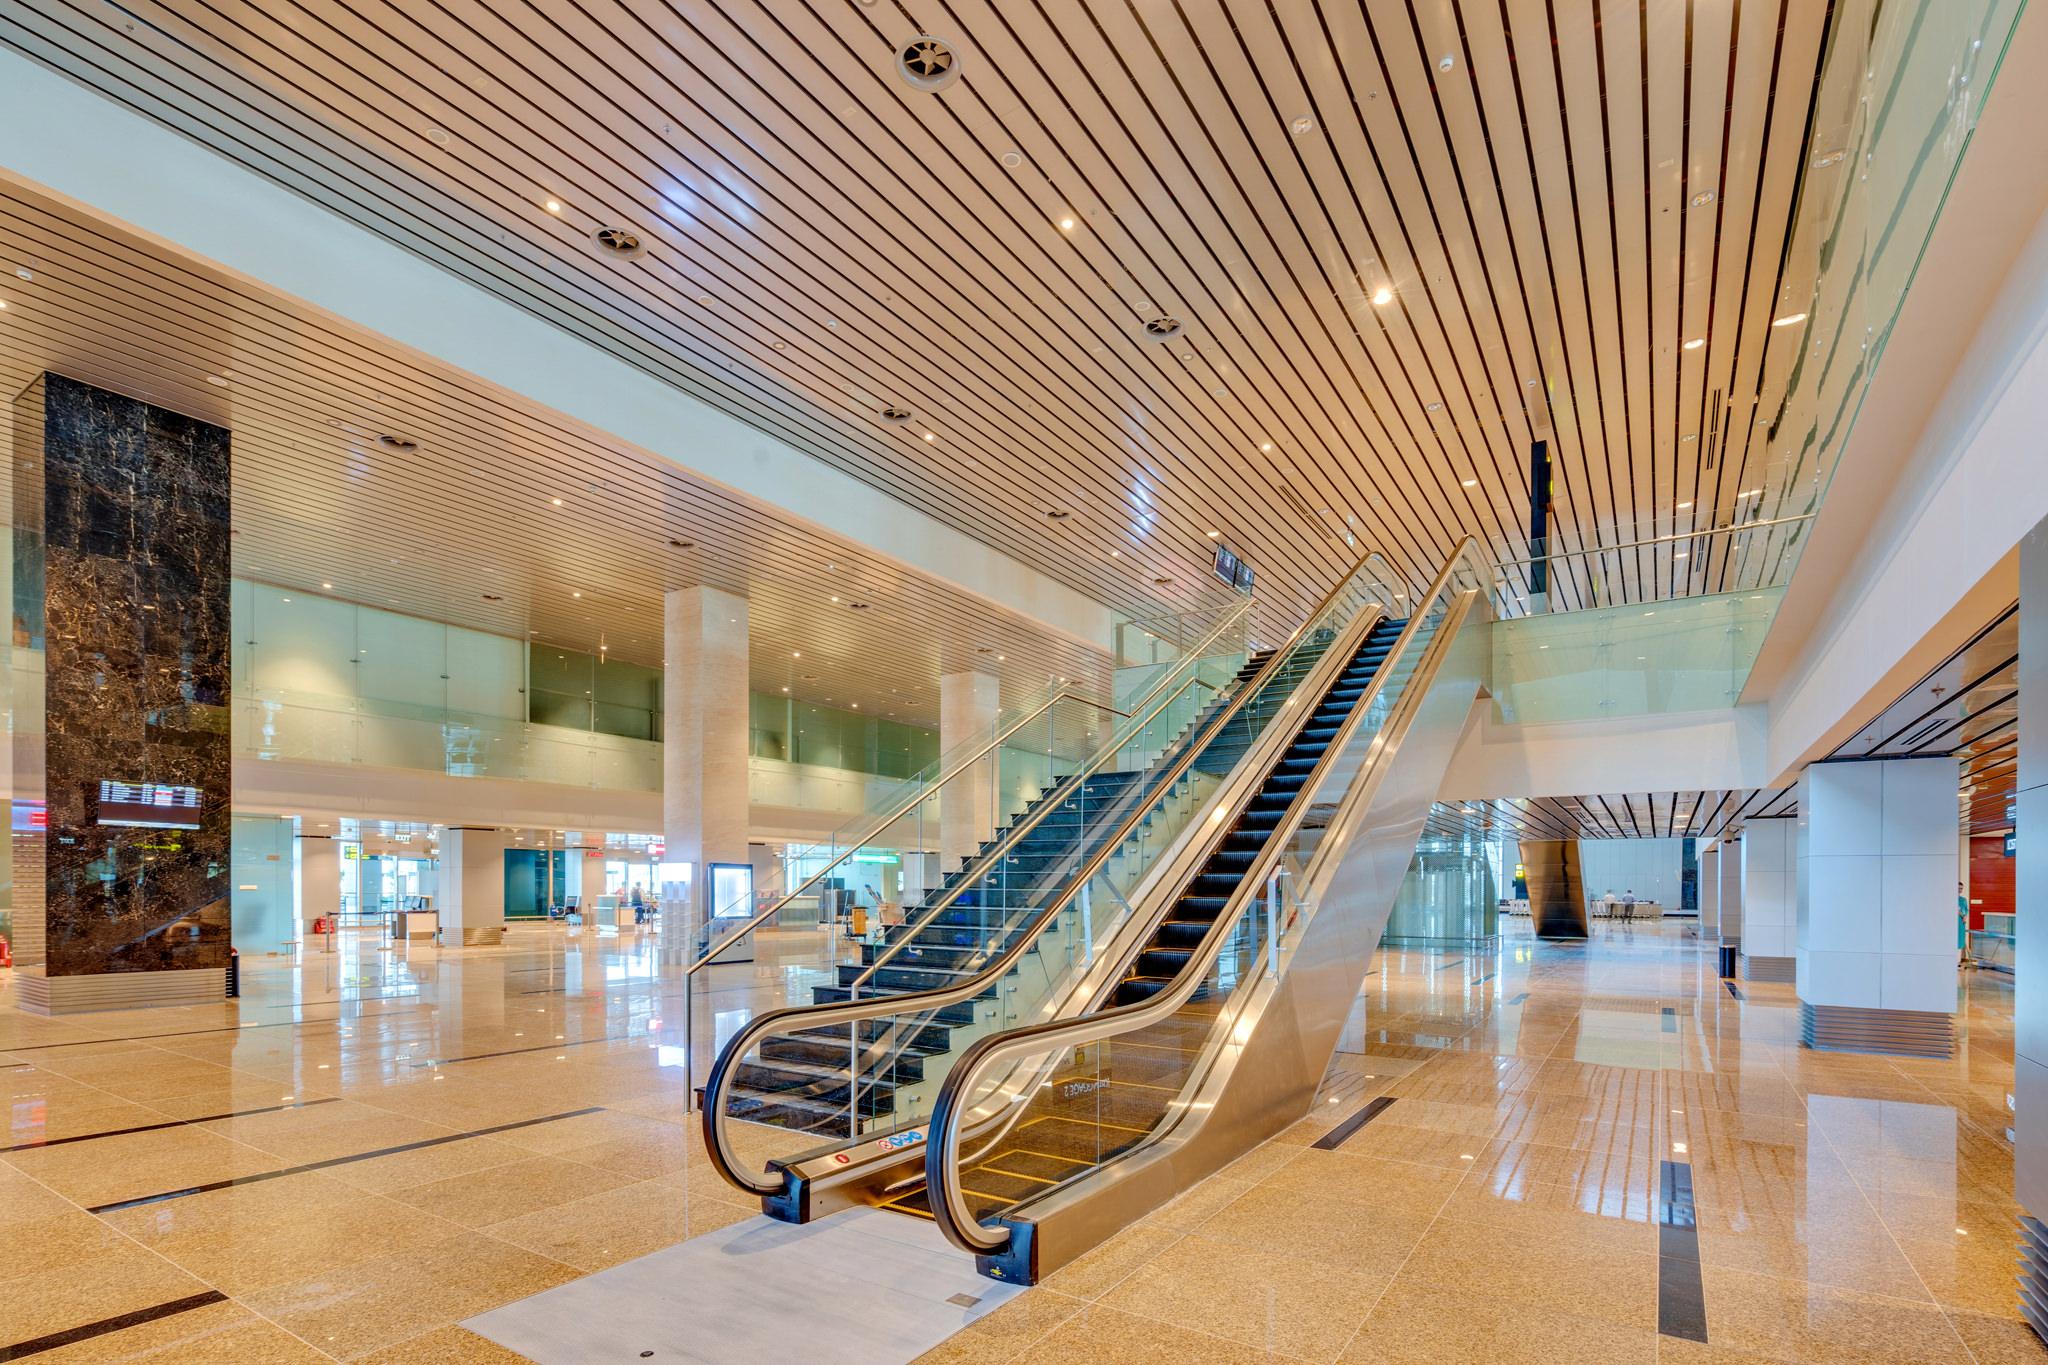 20180626 - Cam Ranh Airport - Architecture - 0141.jpg